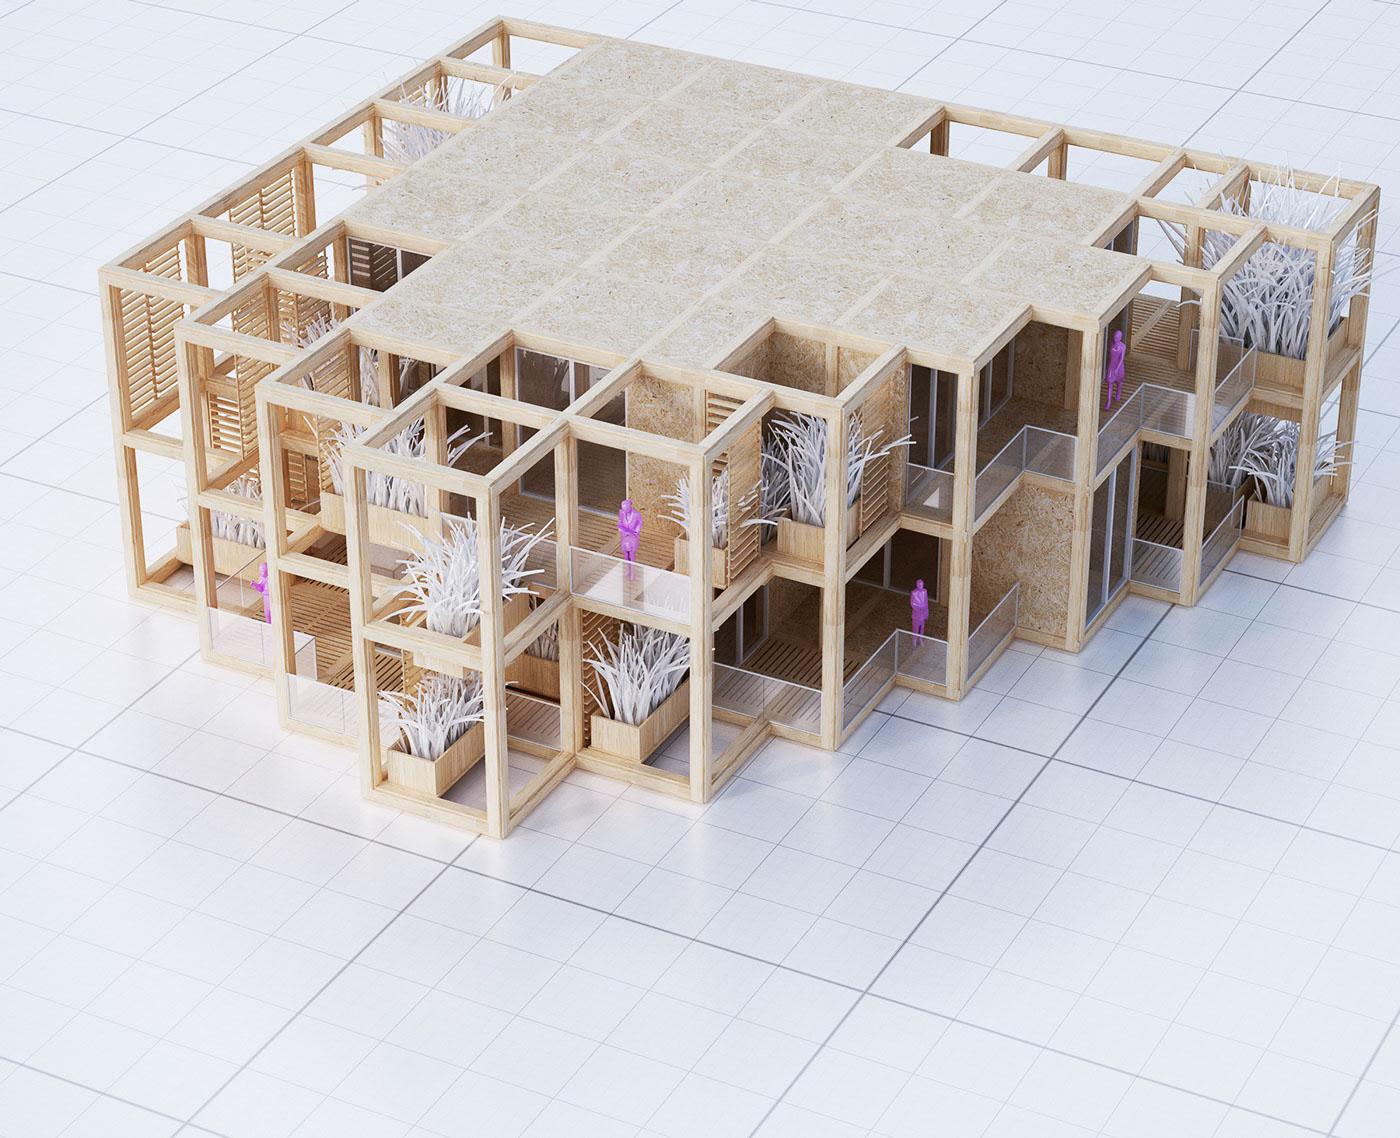 A modular system of a structural framework - ready